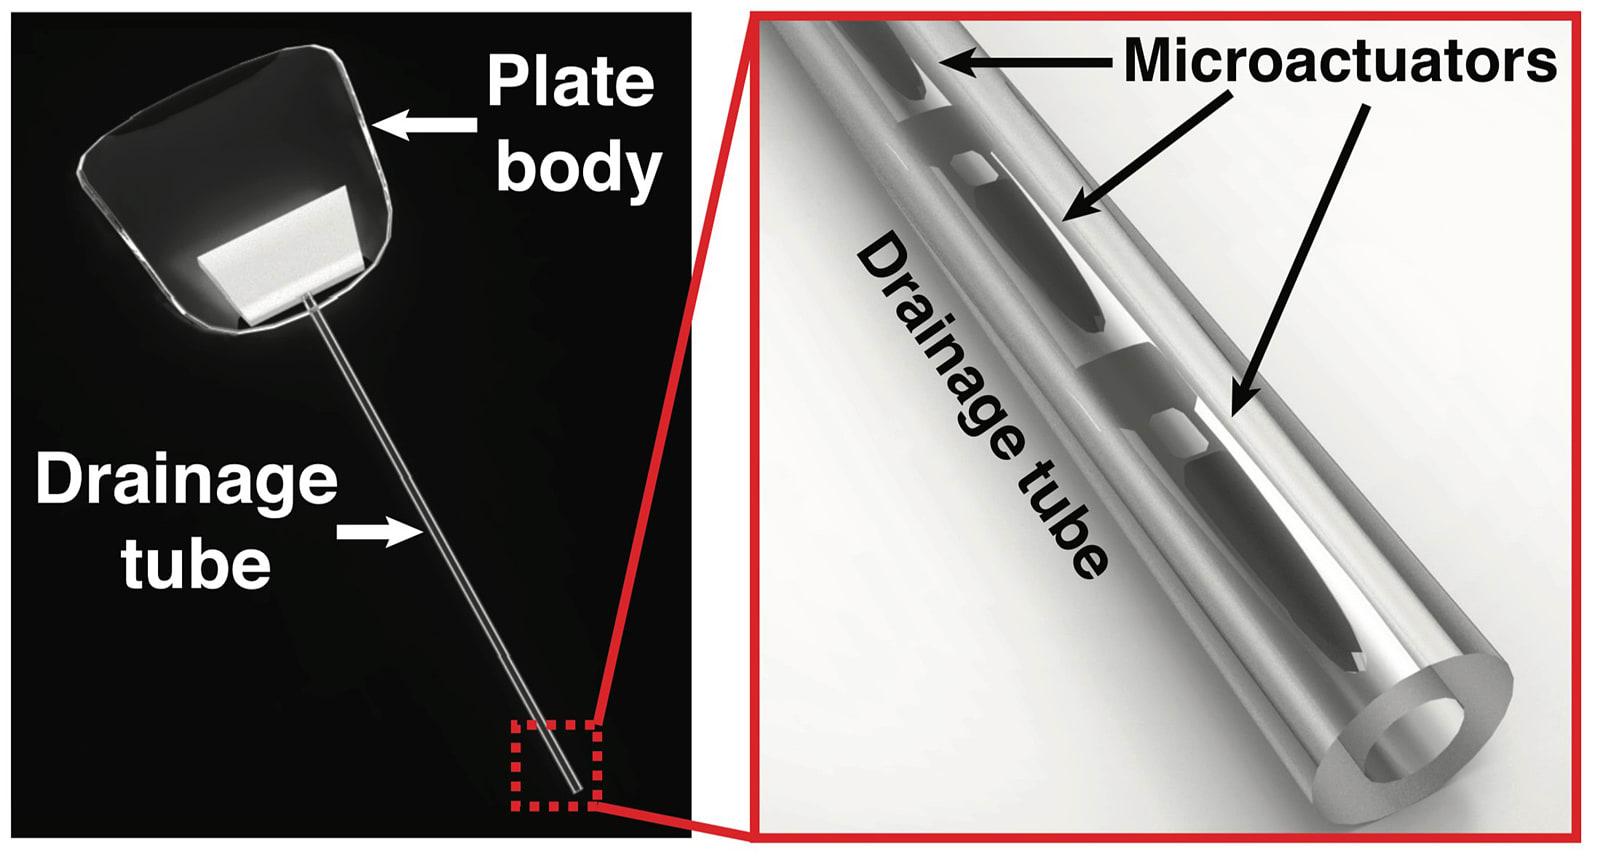 Purdue's magnetic field eye implant